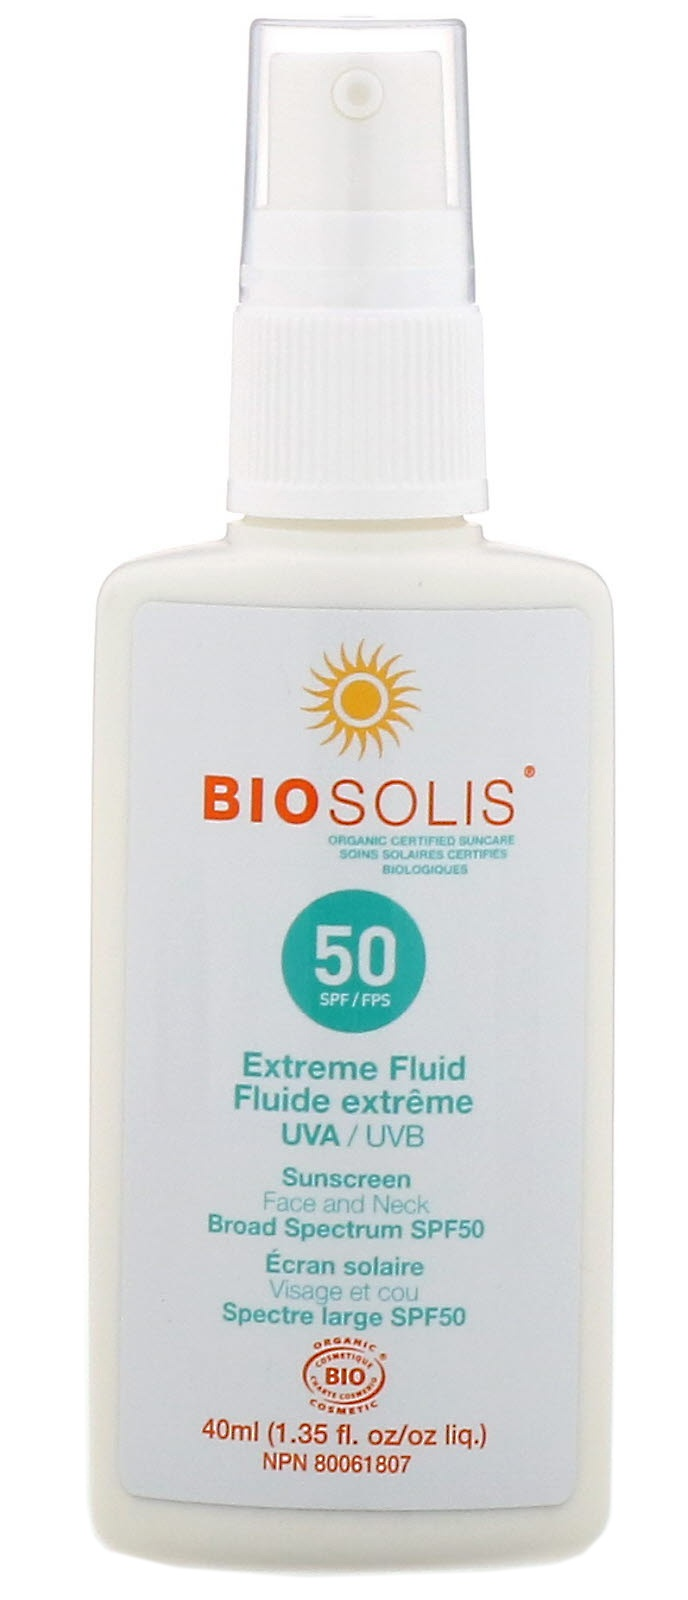 Biosolis Extreme Fluid Sunscreen  Spf 50